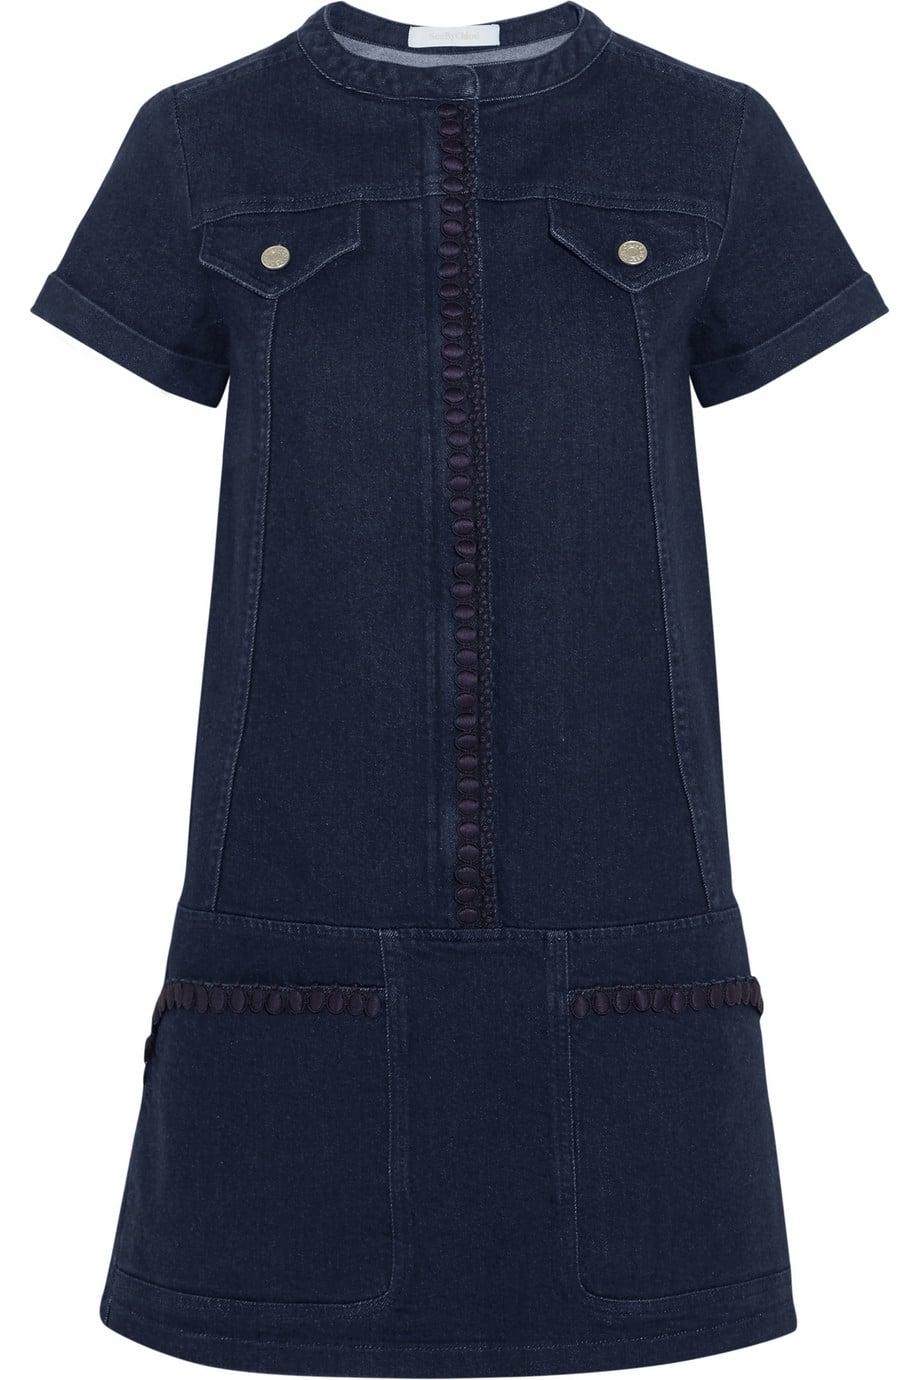 Little Blue Dress Chloe Blue Denim